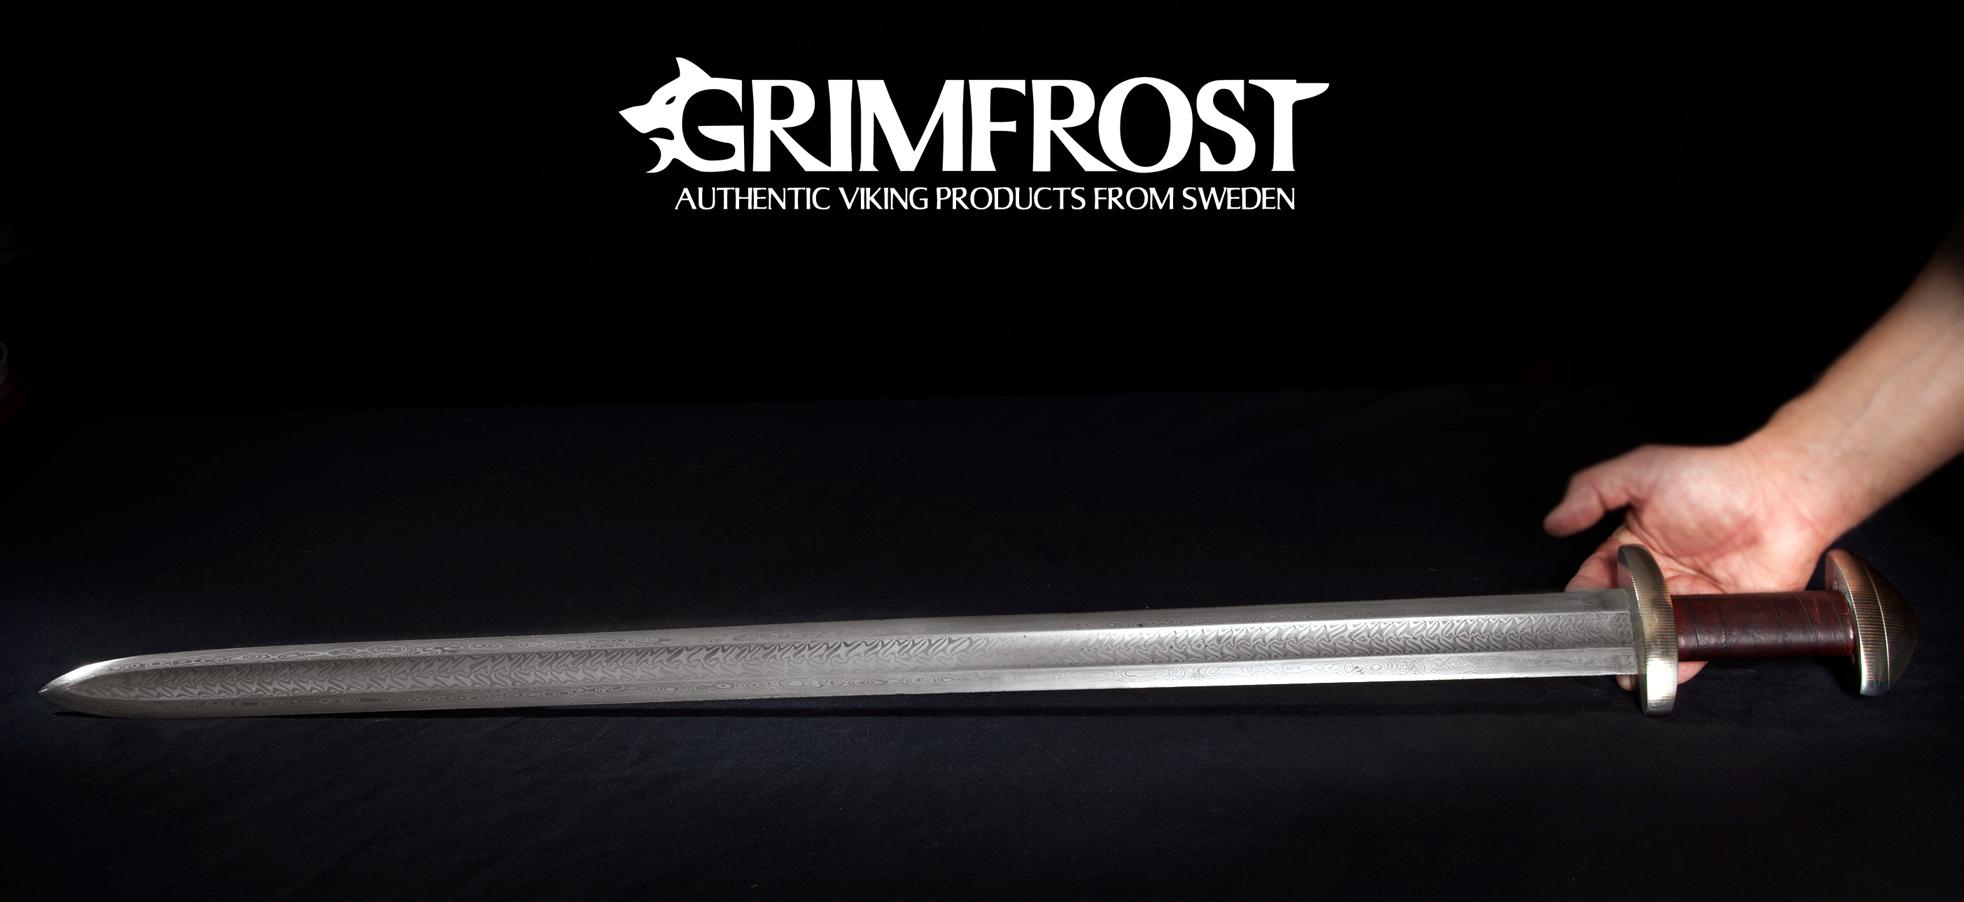 Pattern Welded Sword New Inspiration Design